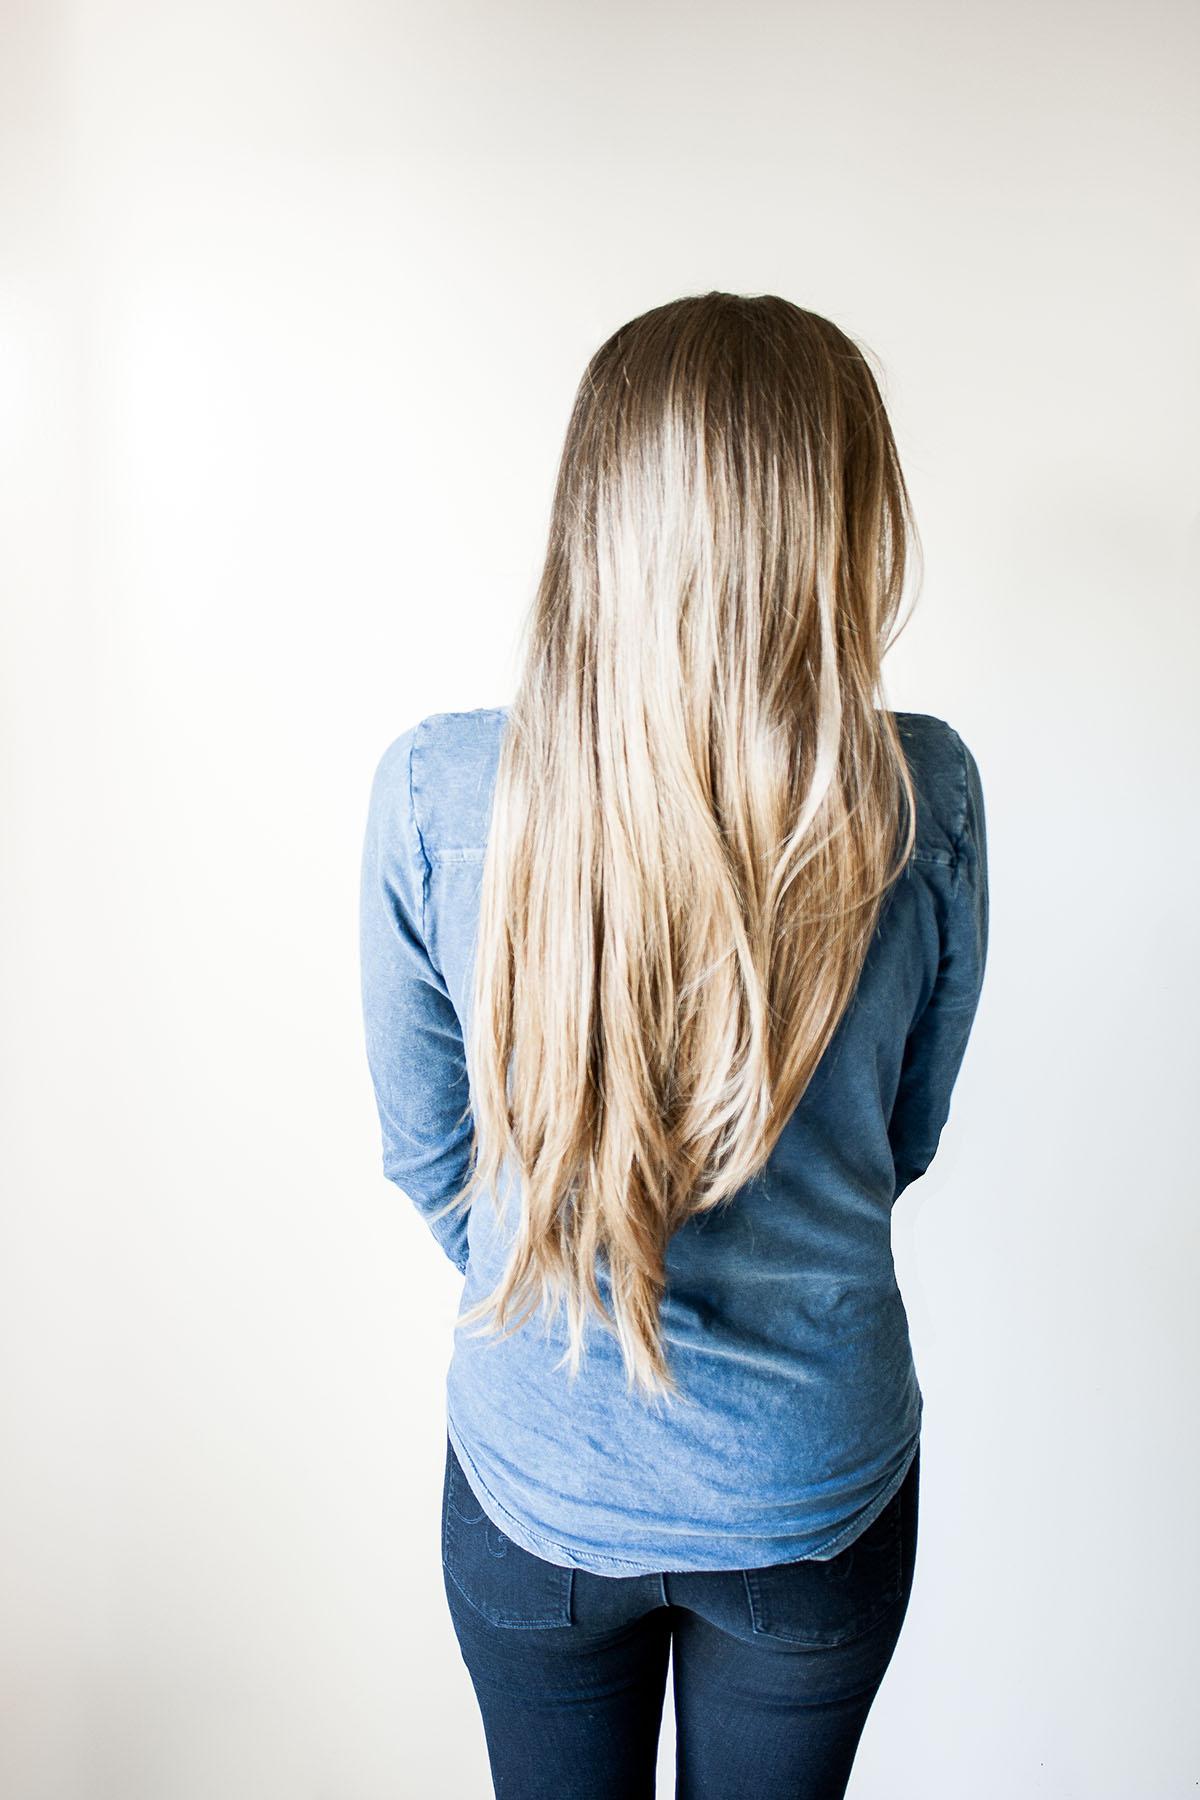 Natural Non-toxic Safe Hair Care for Long Bronde Blonde Brunette Locks